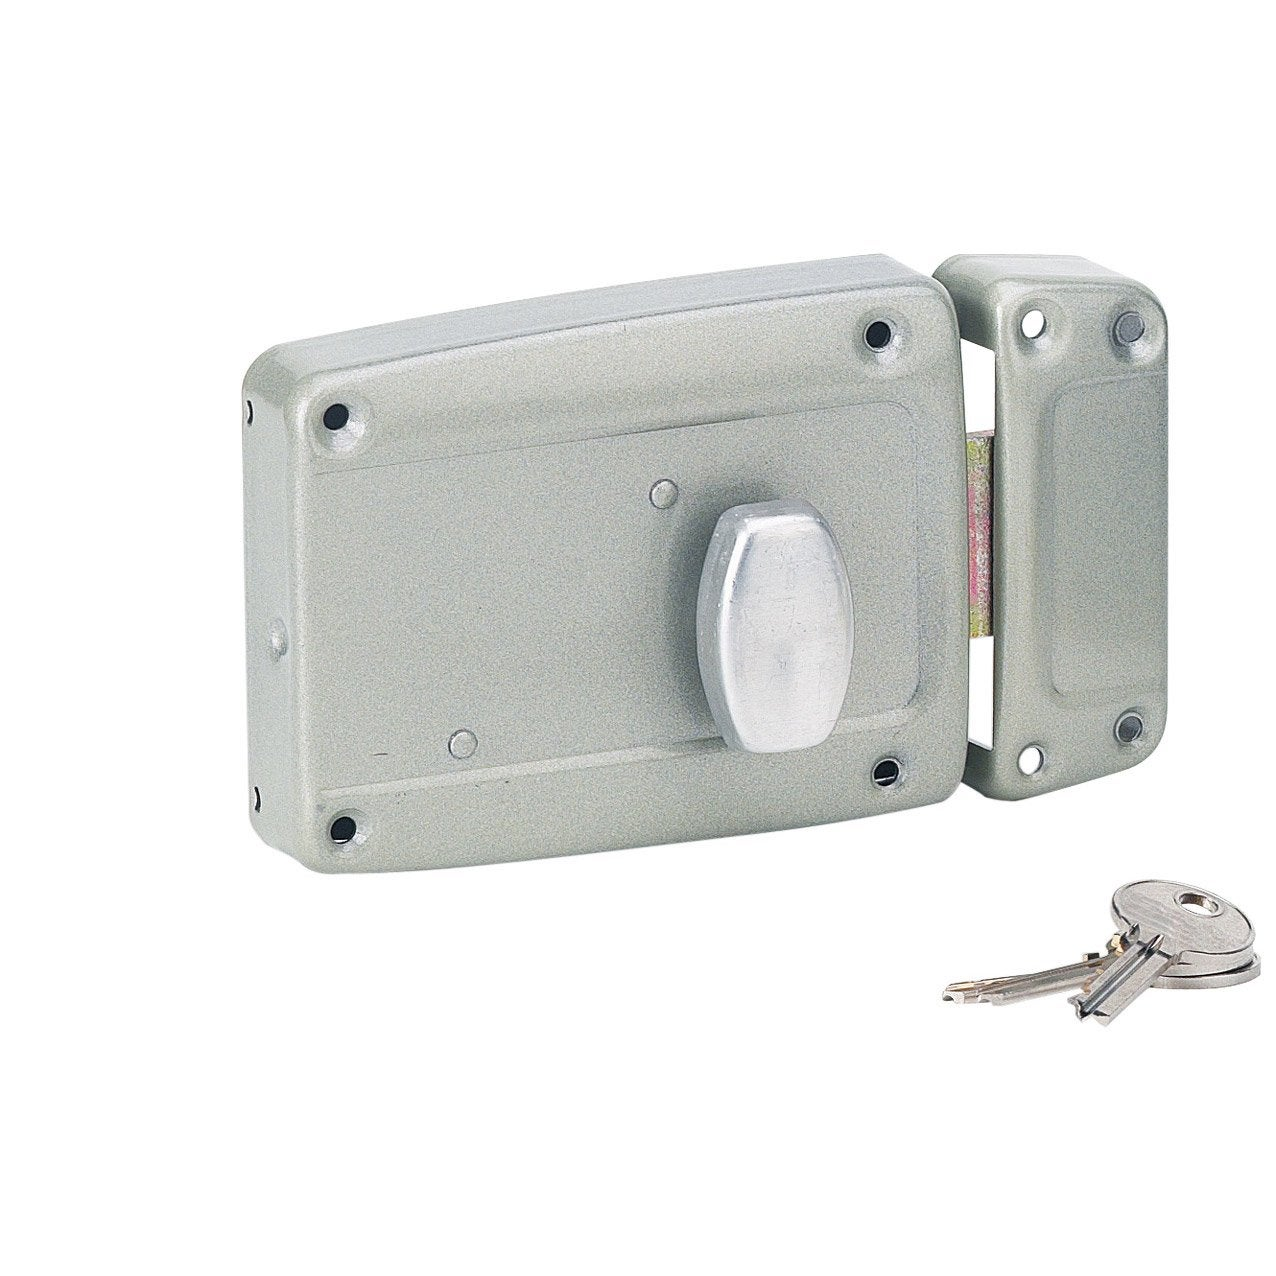 Serrure en applique thirard axe 70 mm poign e ouverture droite leroy merlin - Poignee serrure porte de garage ...